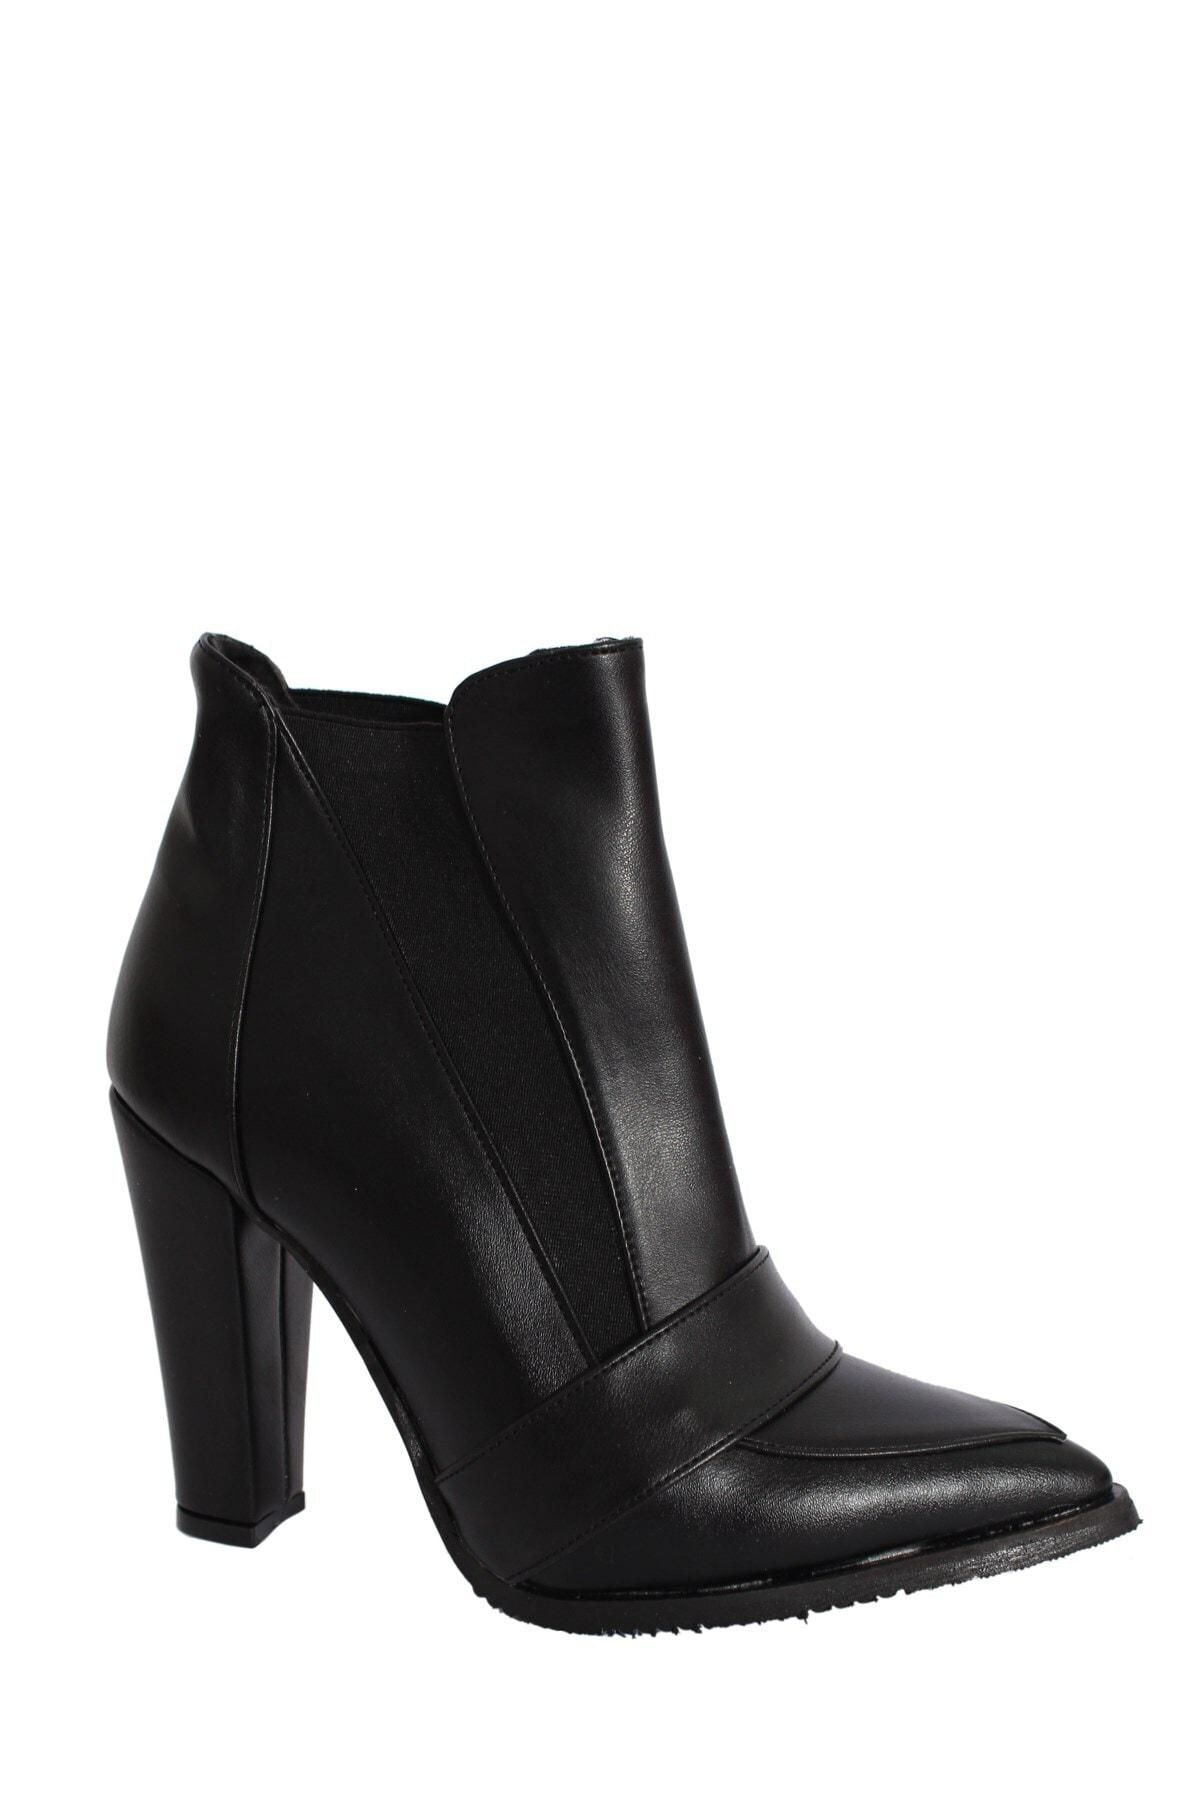 Derigo Kadın Siyah Topuklu Bot 41119